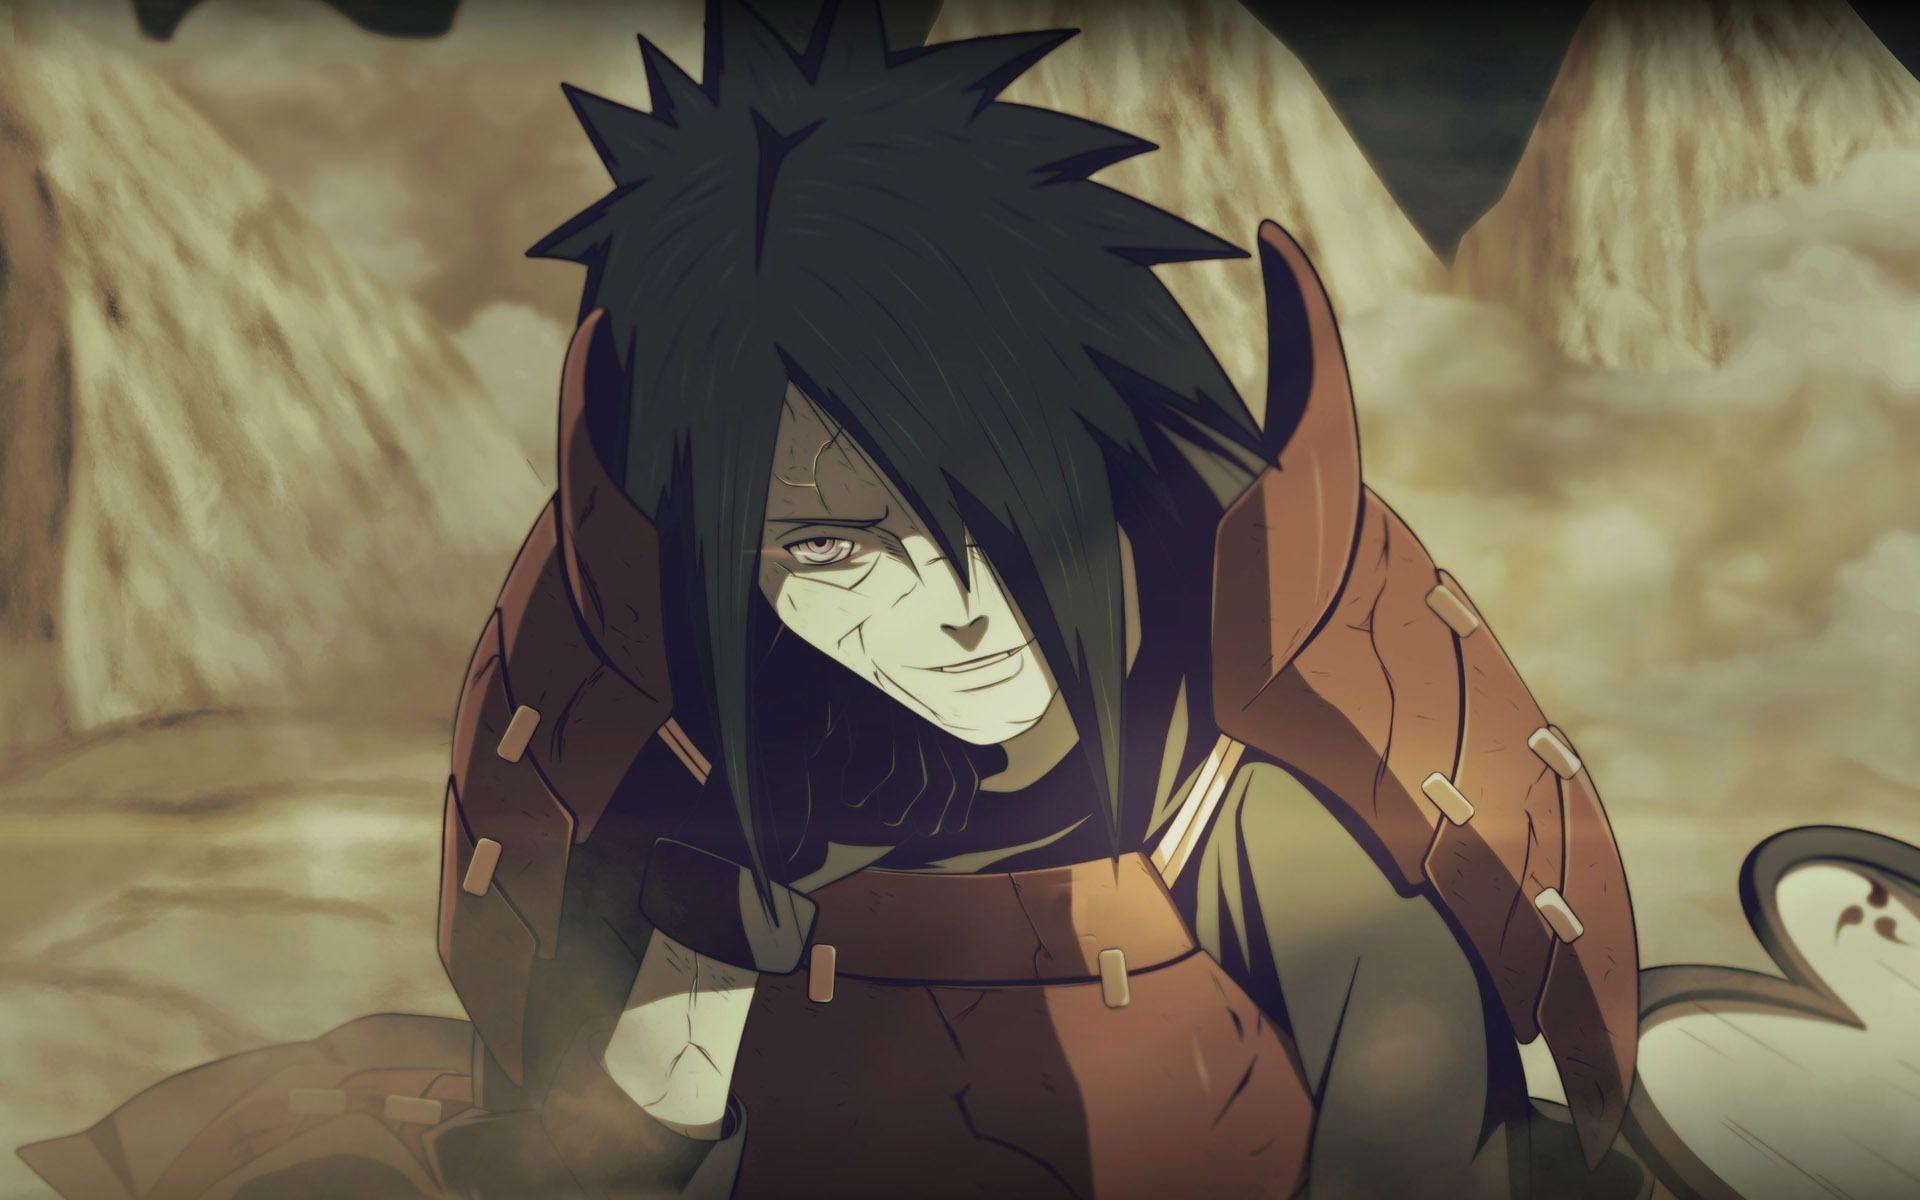 Naruto Shippuuden images madara uchiha wallpaper and background .